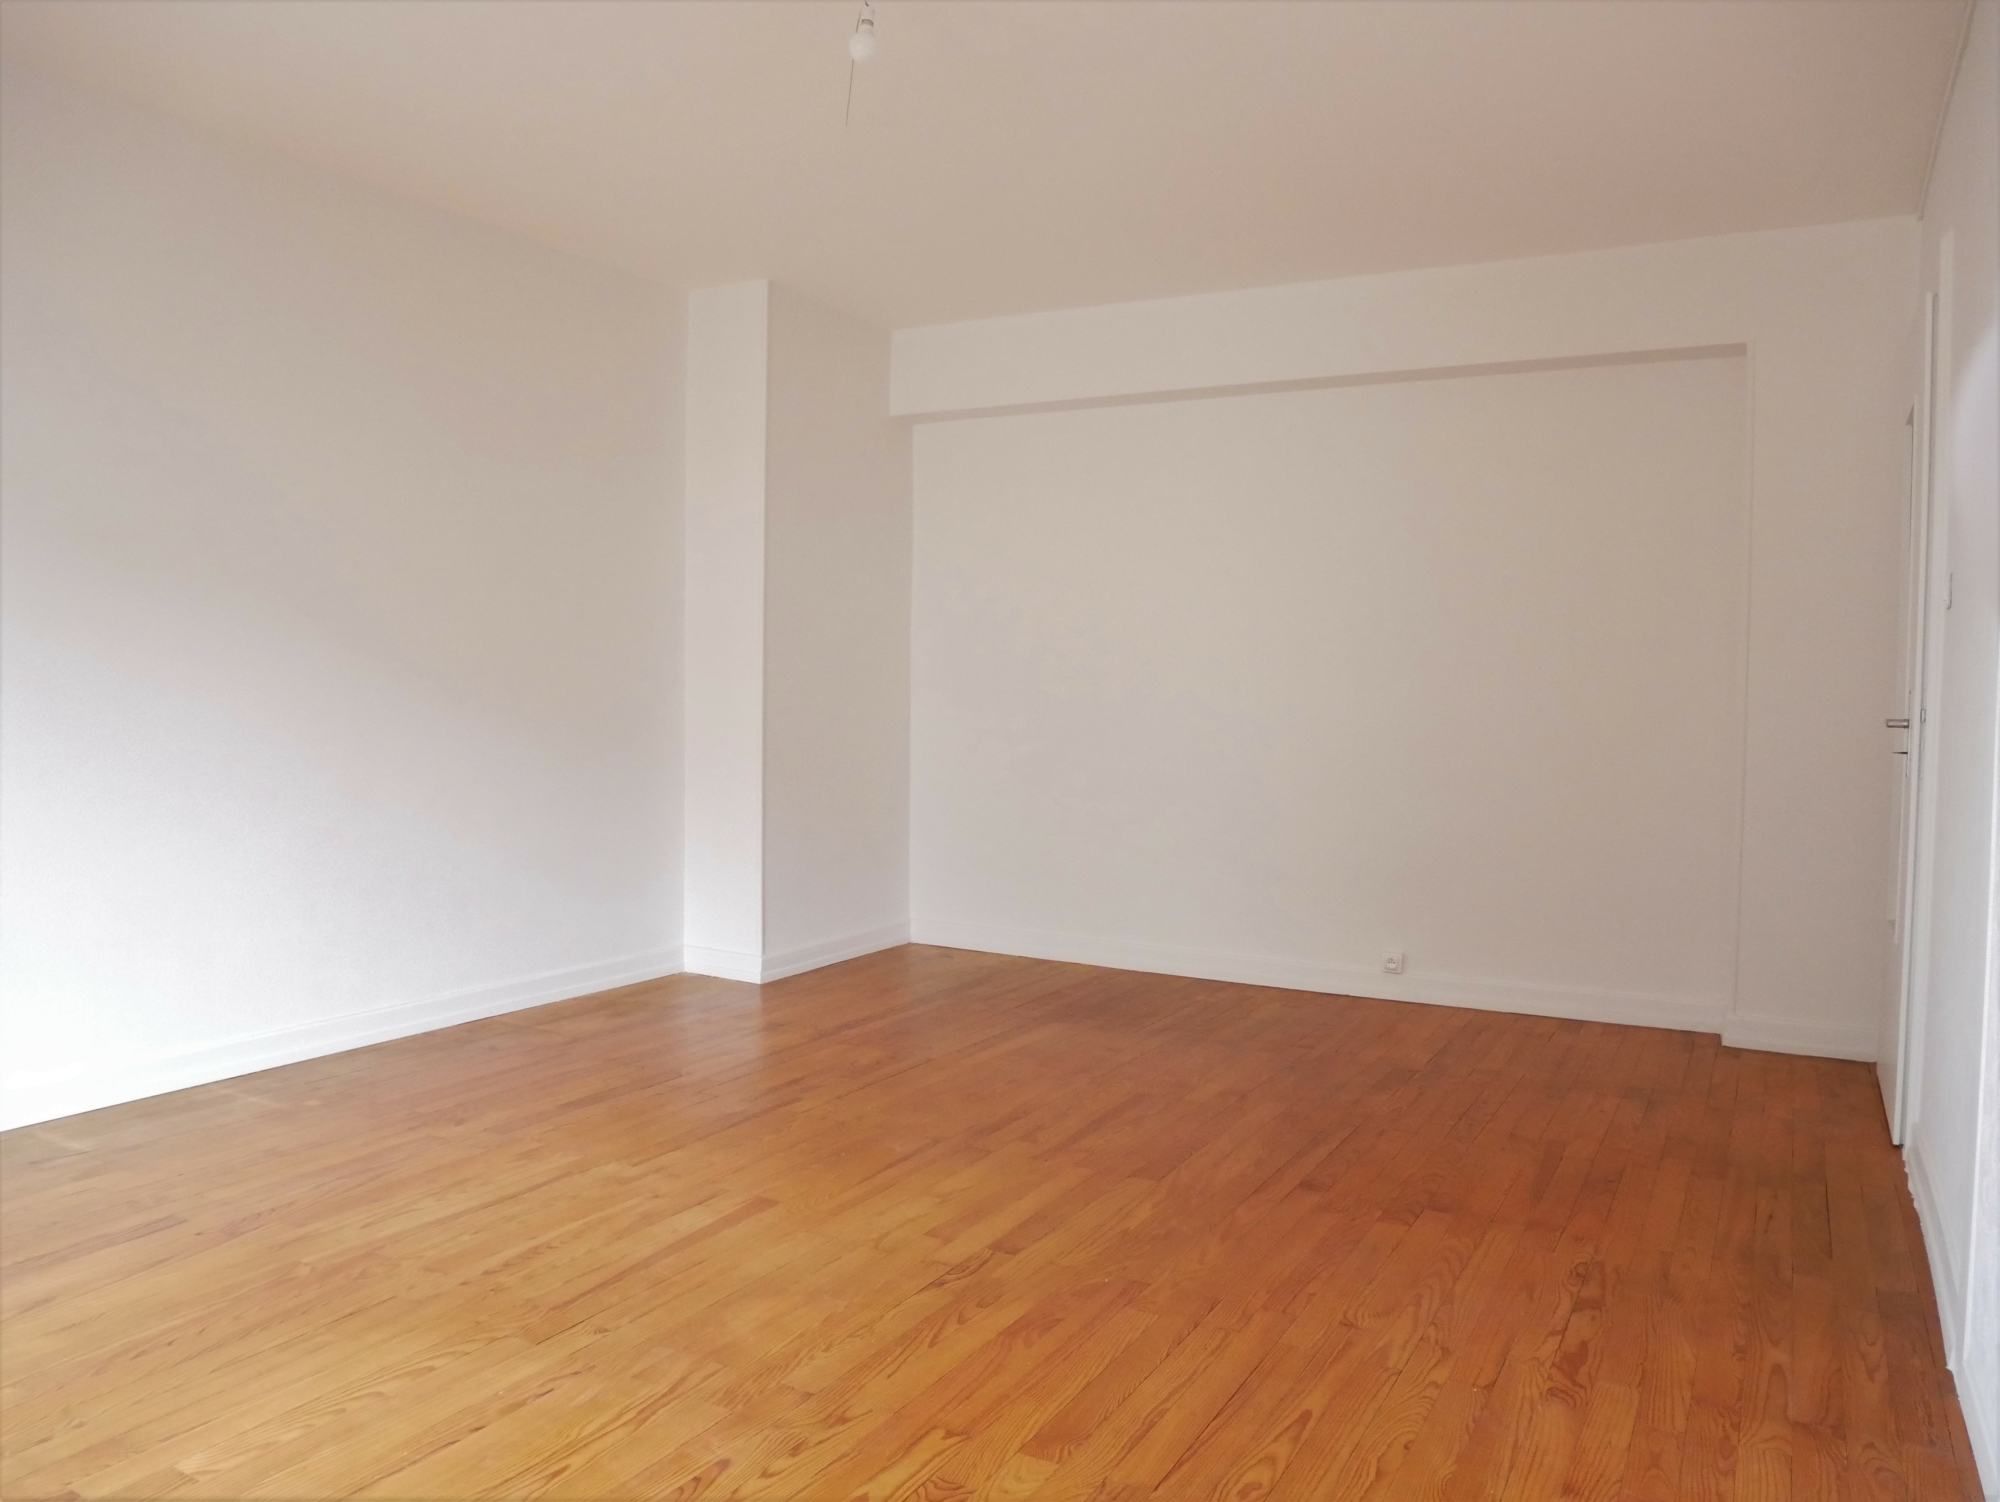 Lumineux appartement 3 pièces avec balcon - Strasbourg / Neudorf - nos ventes - Beausite Immobilier 2